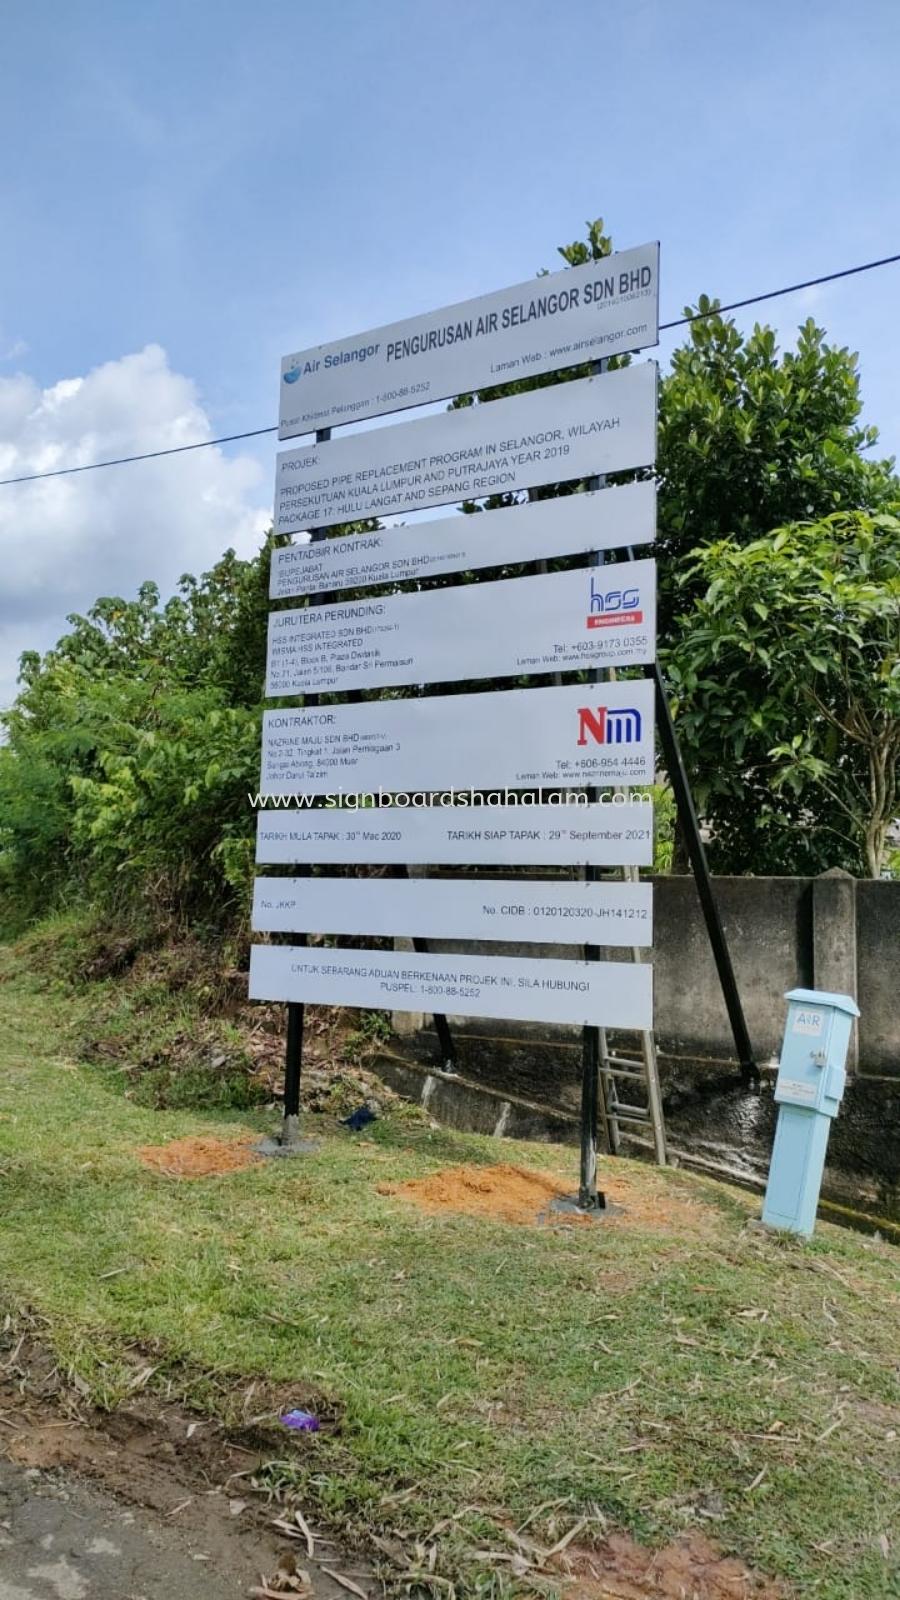 Essential Building Kajang - Project Signage